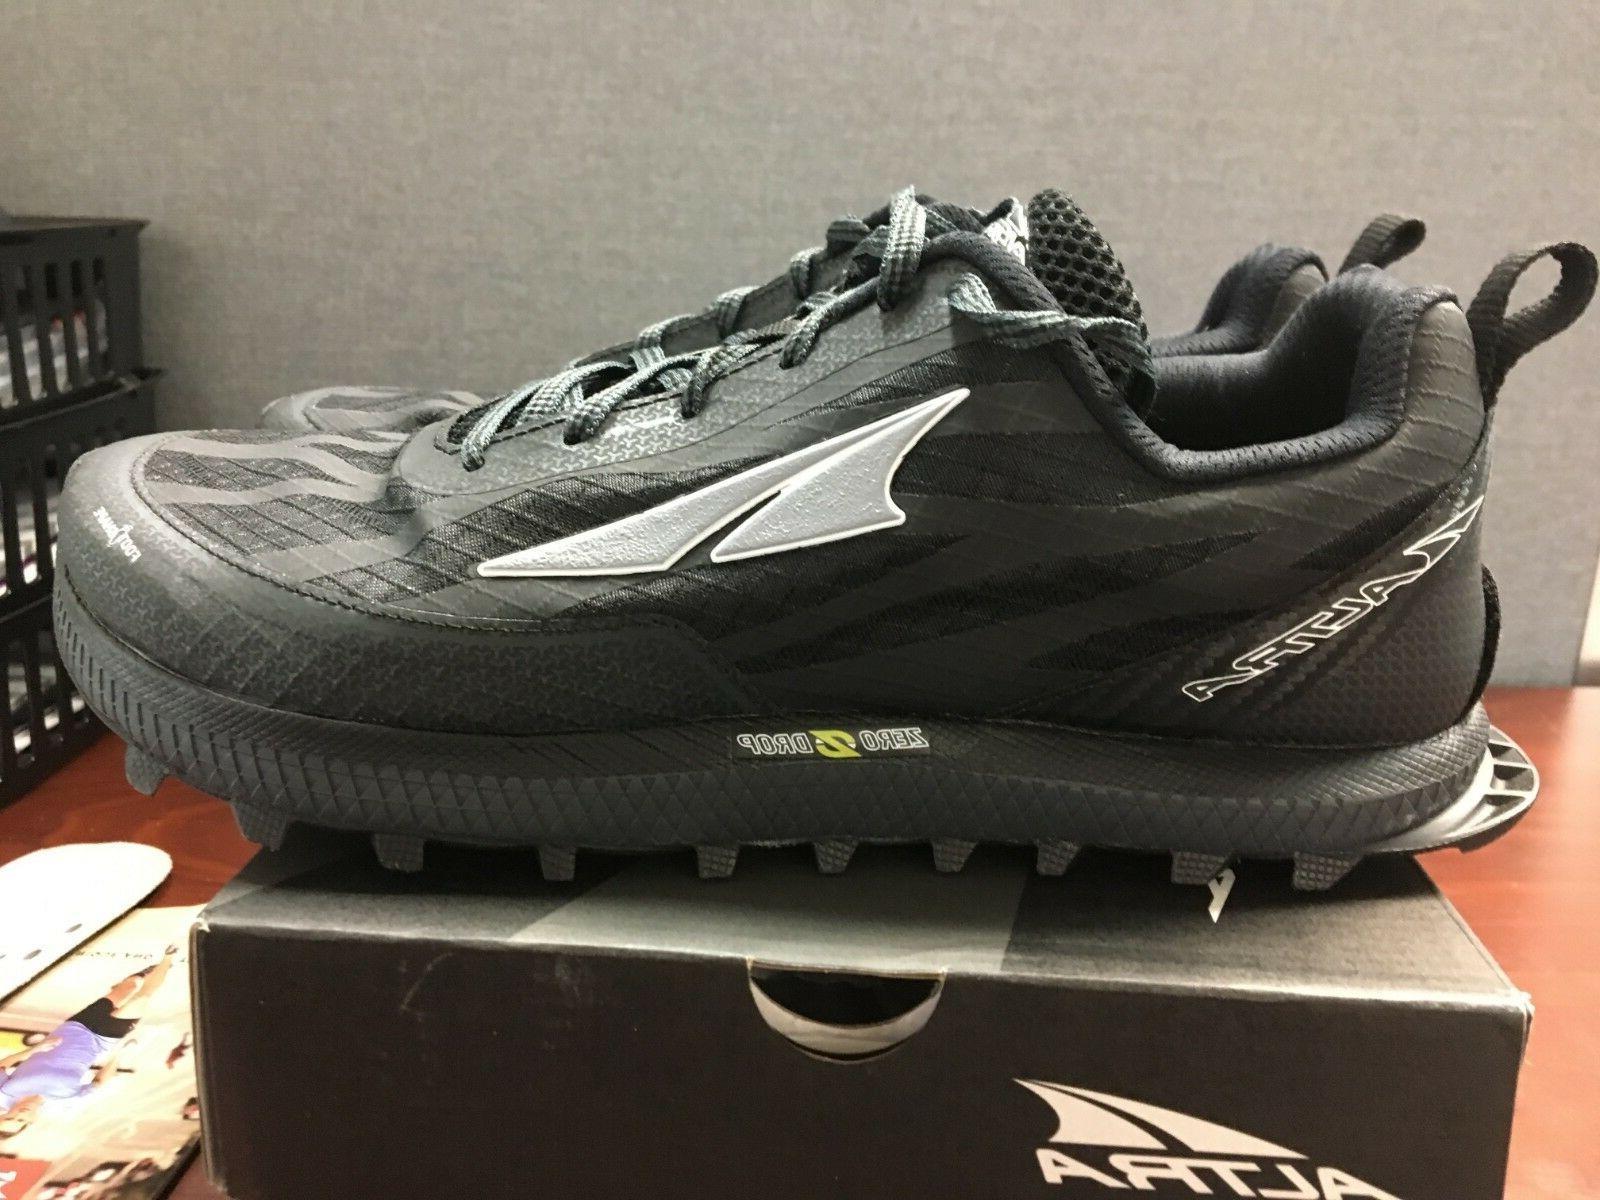 Altra Footwear 3 Trail Running Shoe